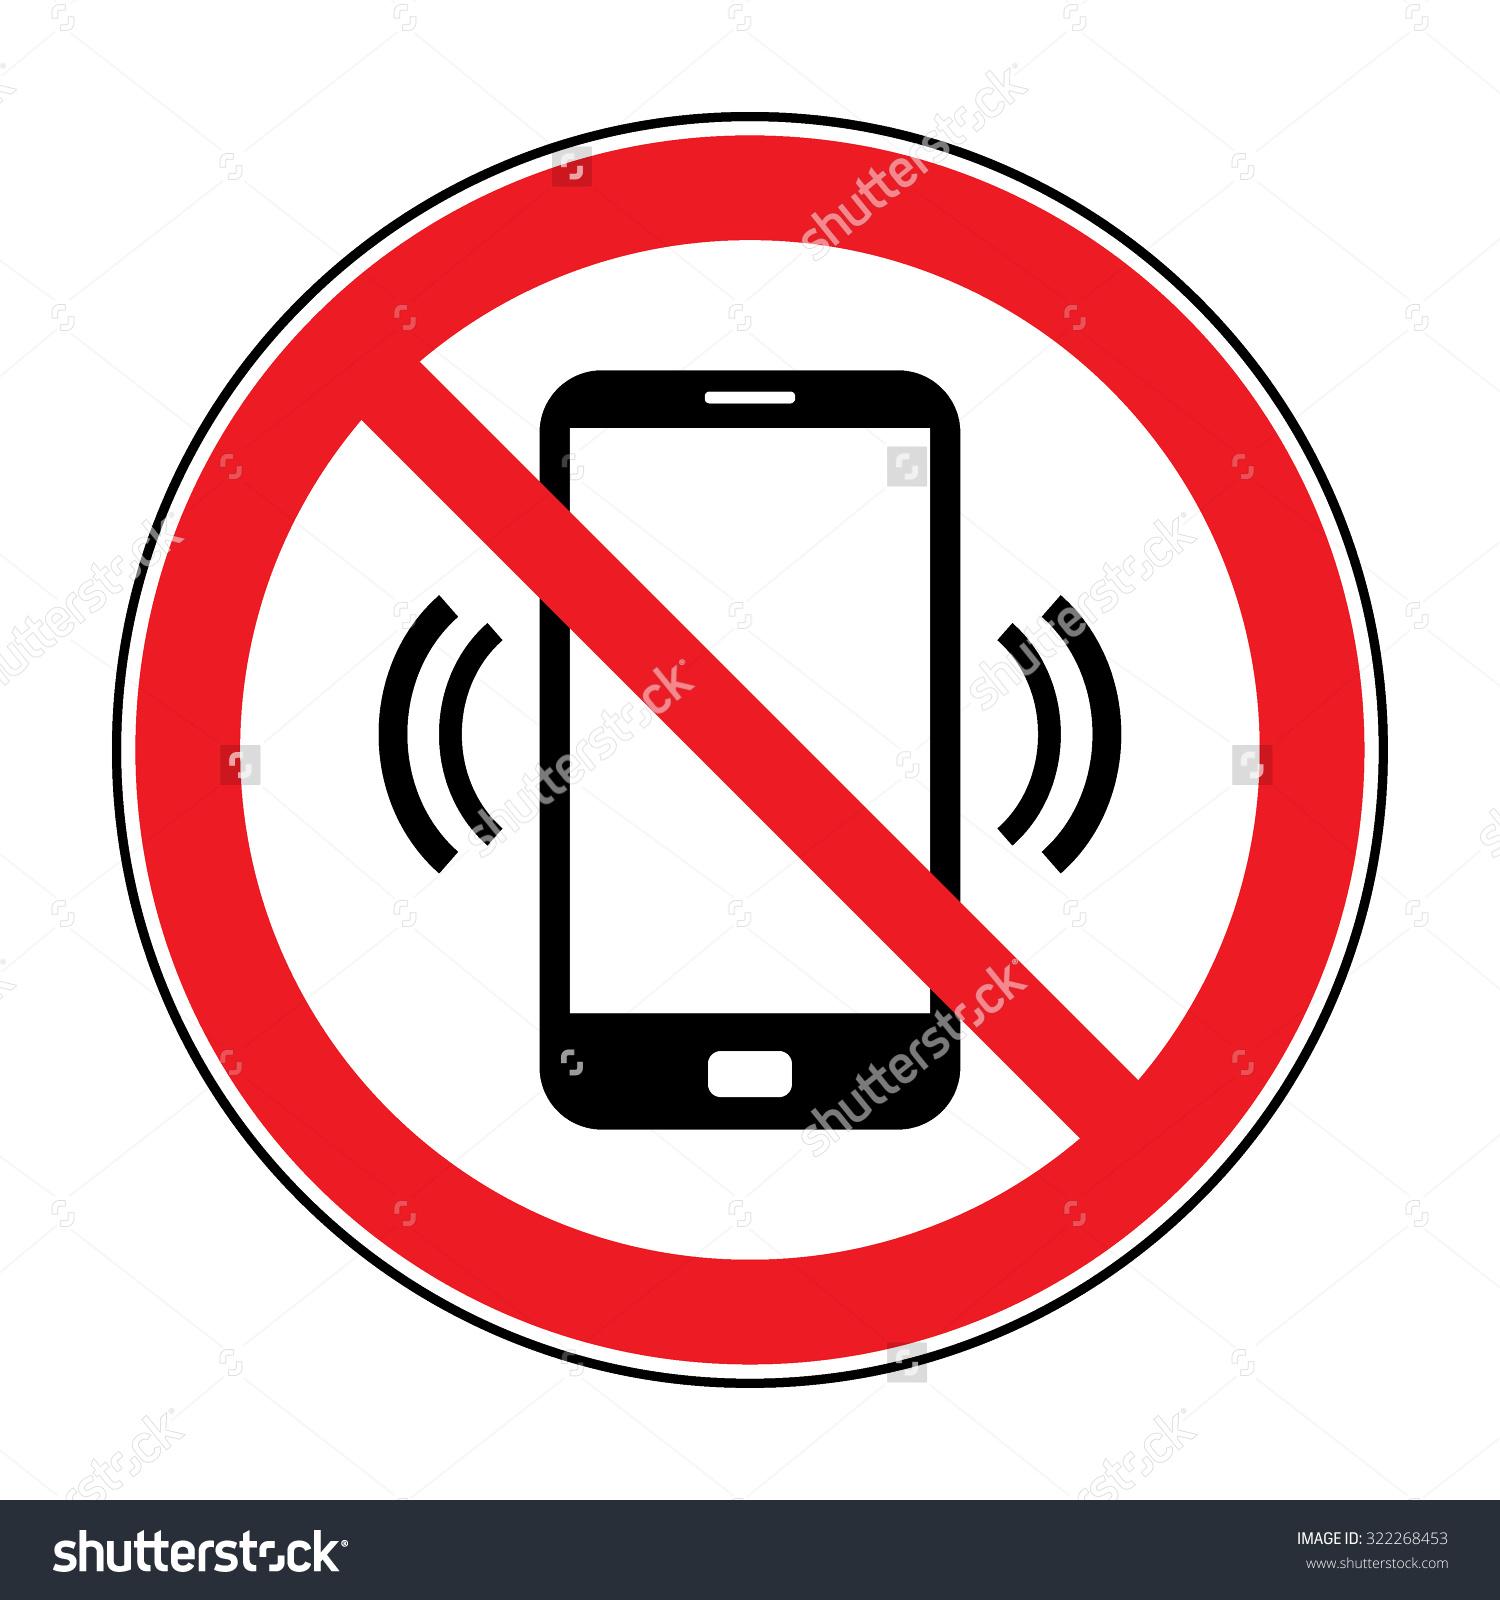 1500x1600 Silence Cell Phone Clip Art – 101 Clip Art